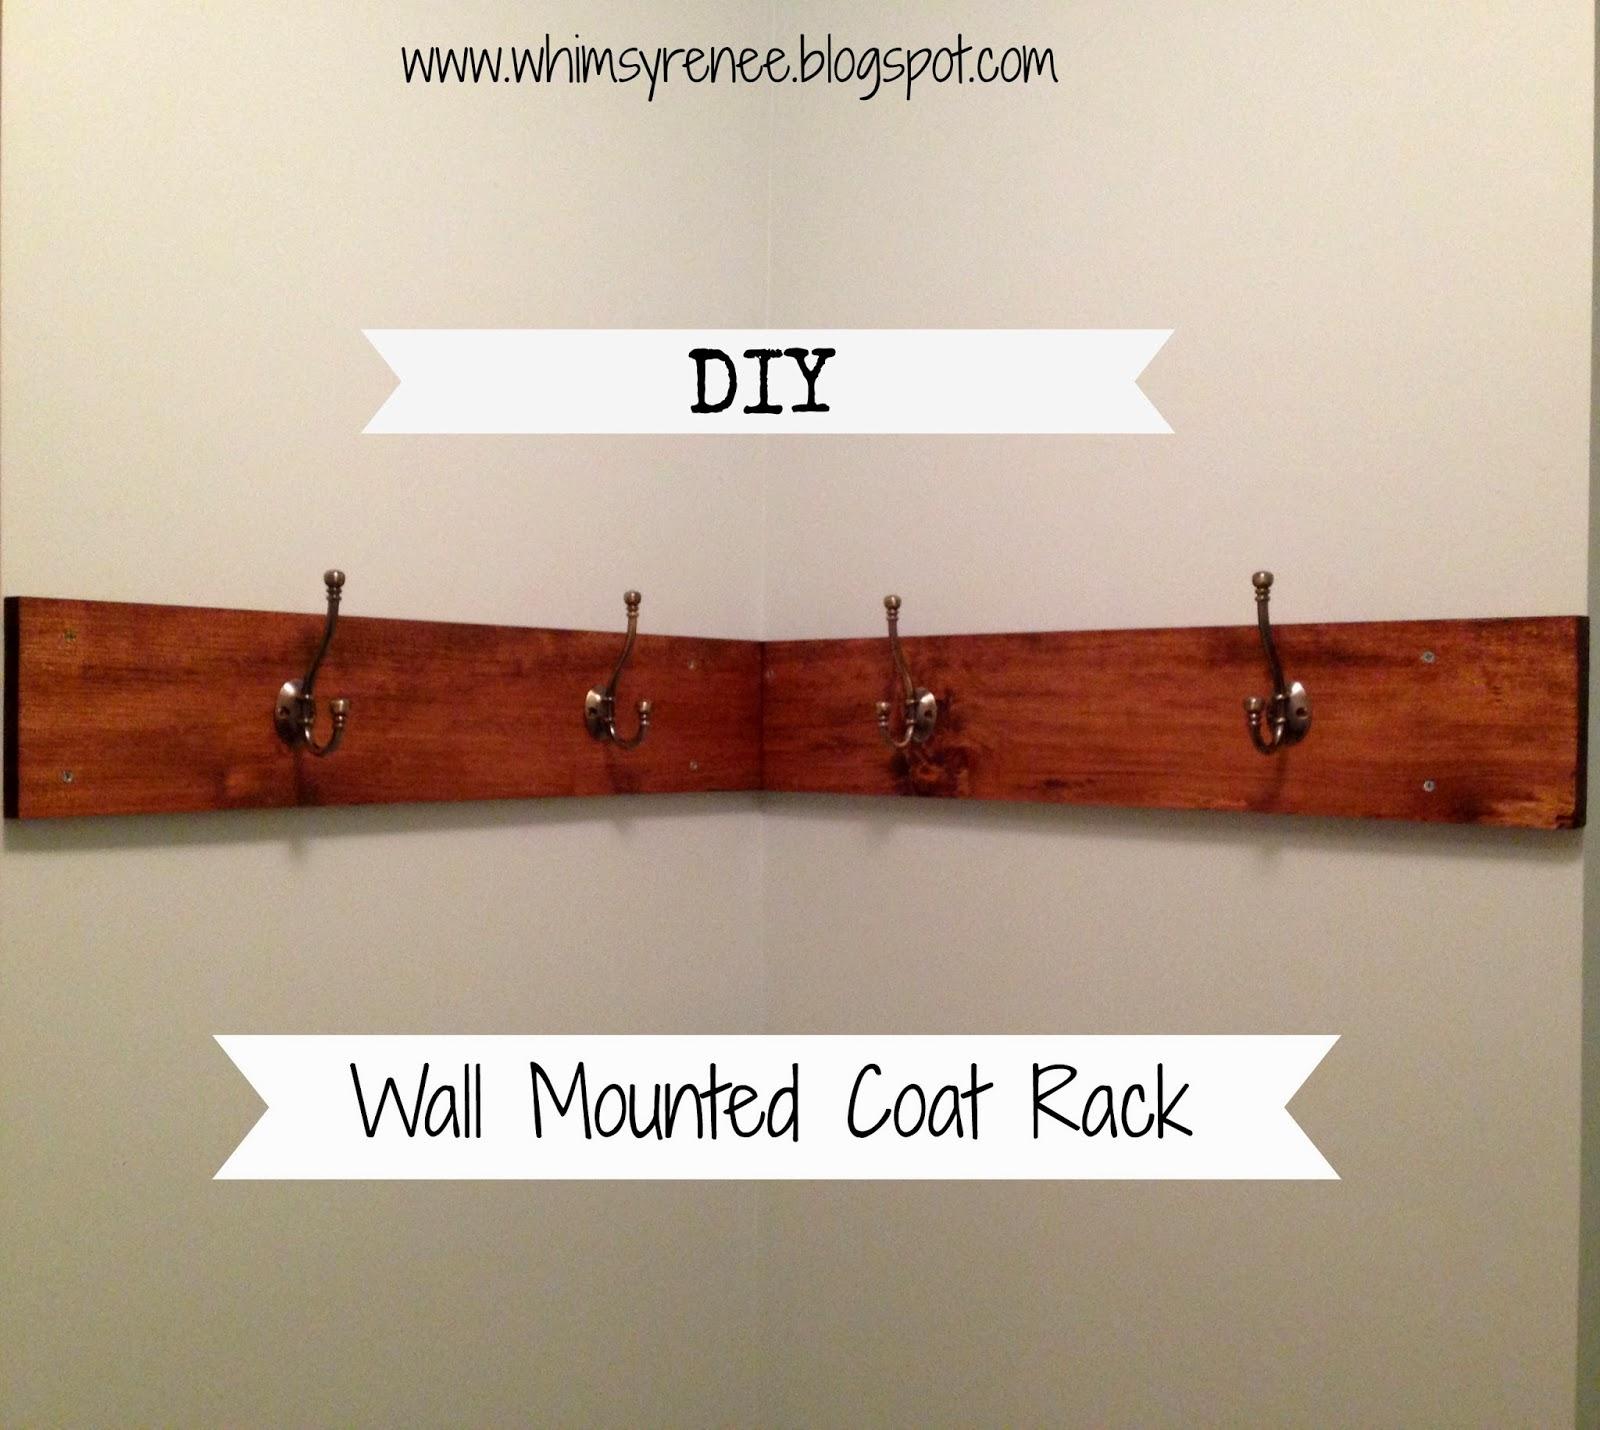 Whimsy Renee: DIY Wall